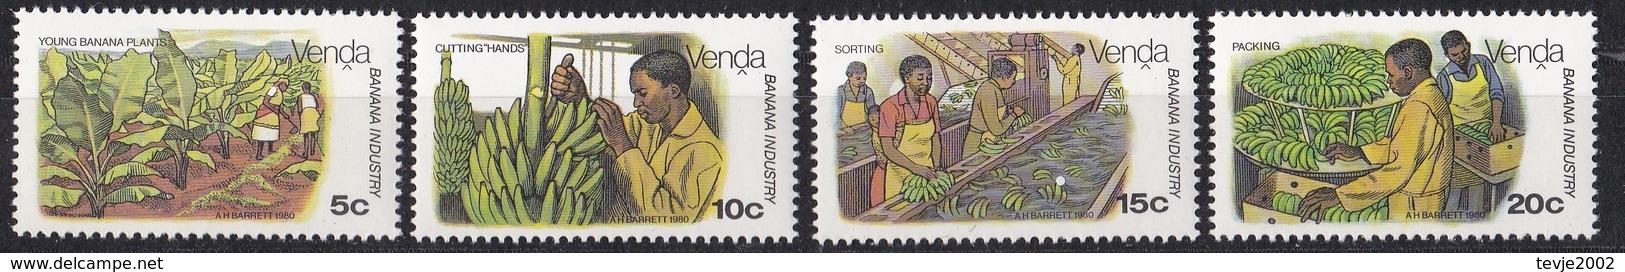 Wib_ Venda - Mi.Nr. 30 - 33 - Postfrisch MNH - Bananen Bananas - Landwirtschaft